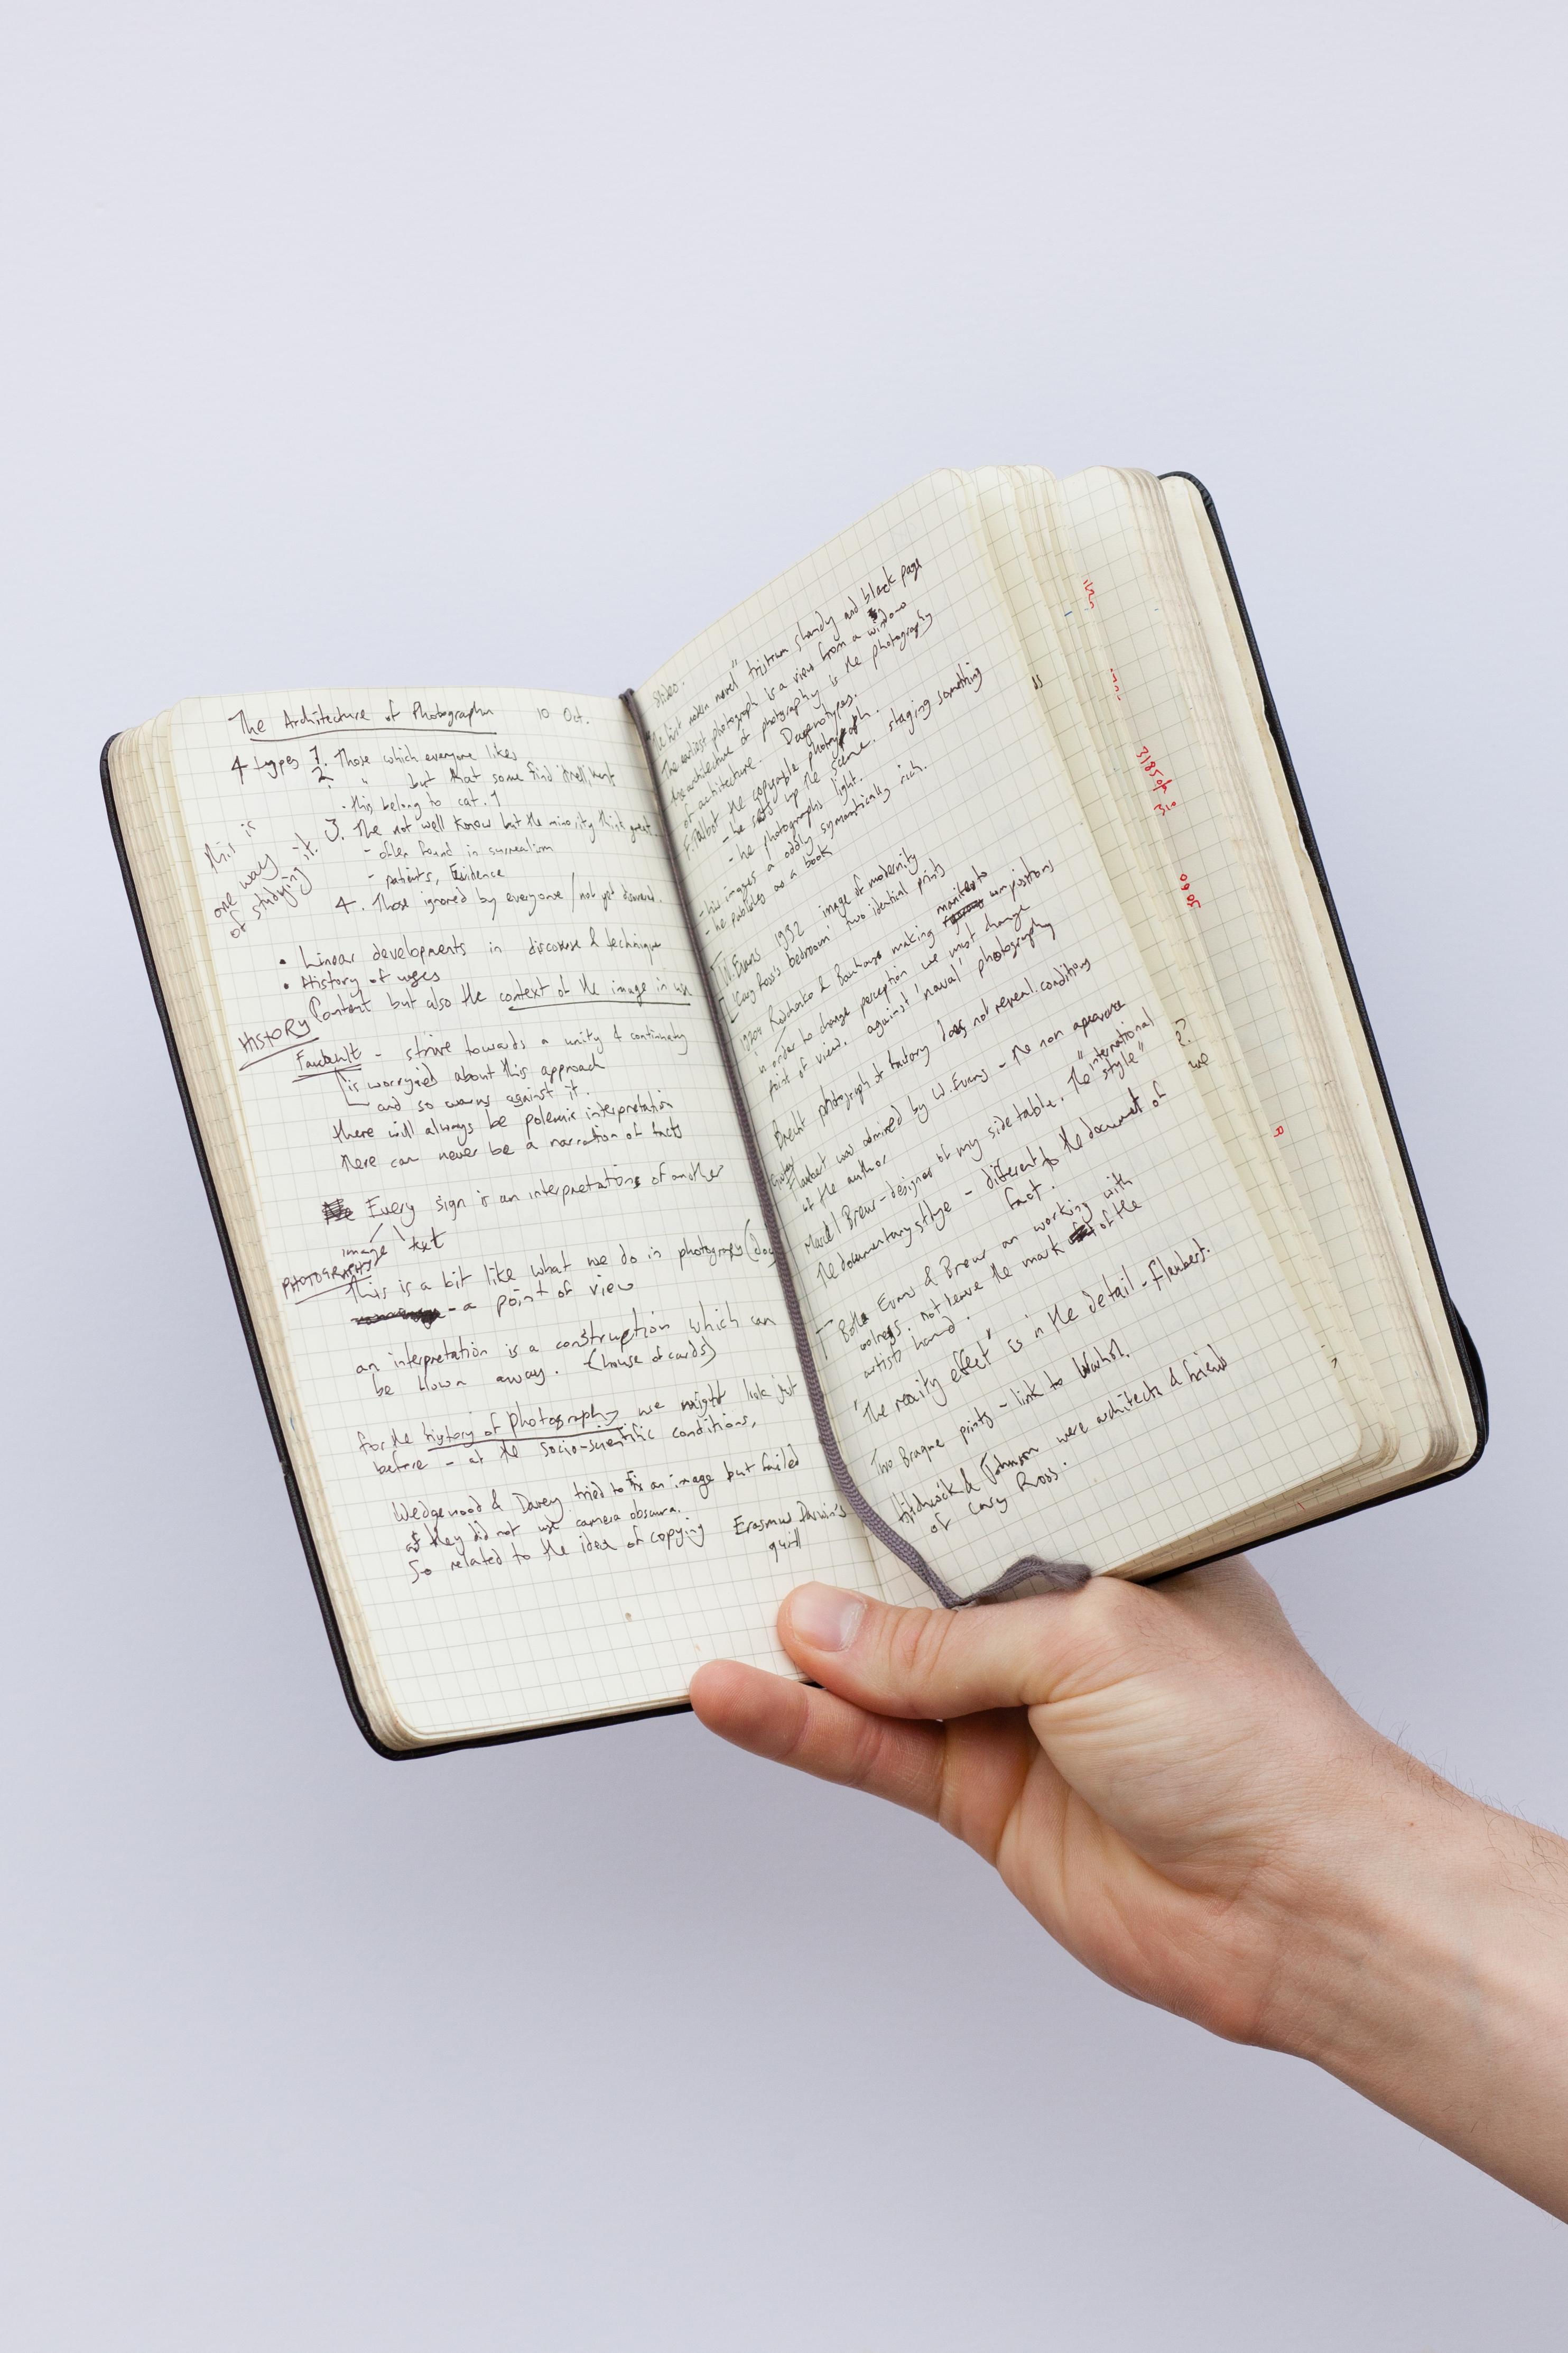 File:Notebook with english handwriting.jpg - Wikimedia Commons